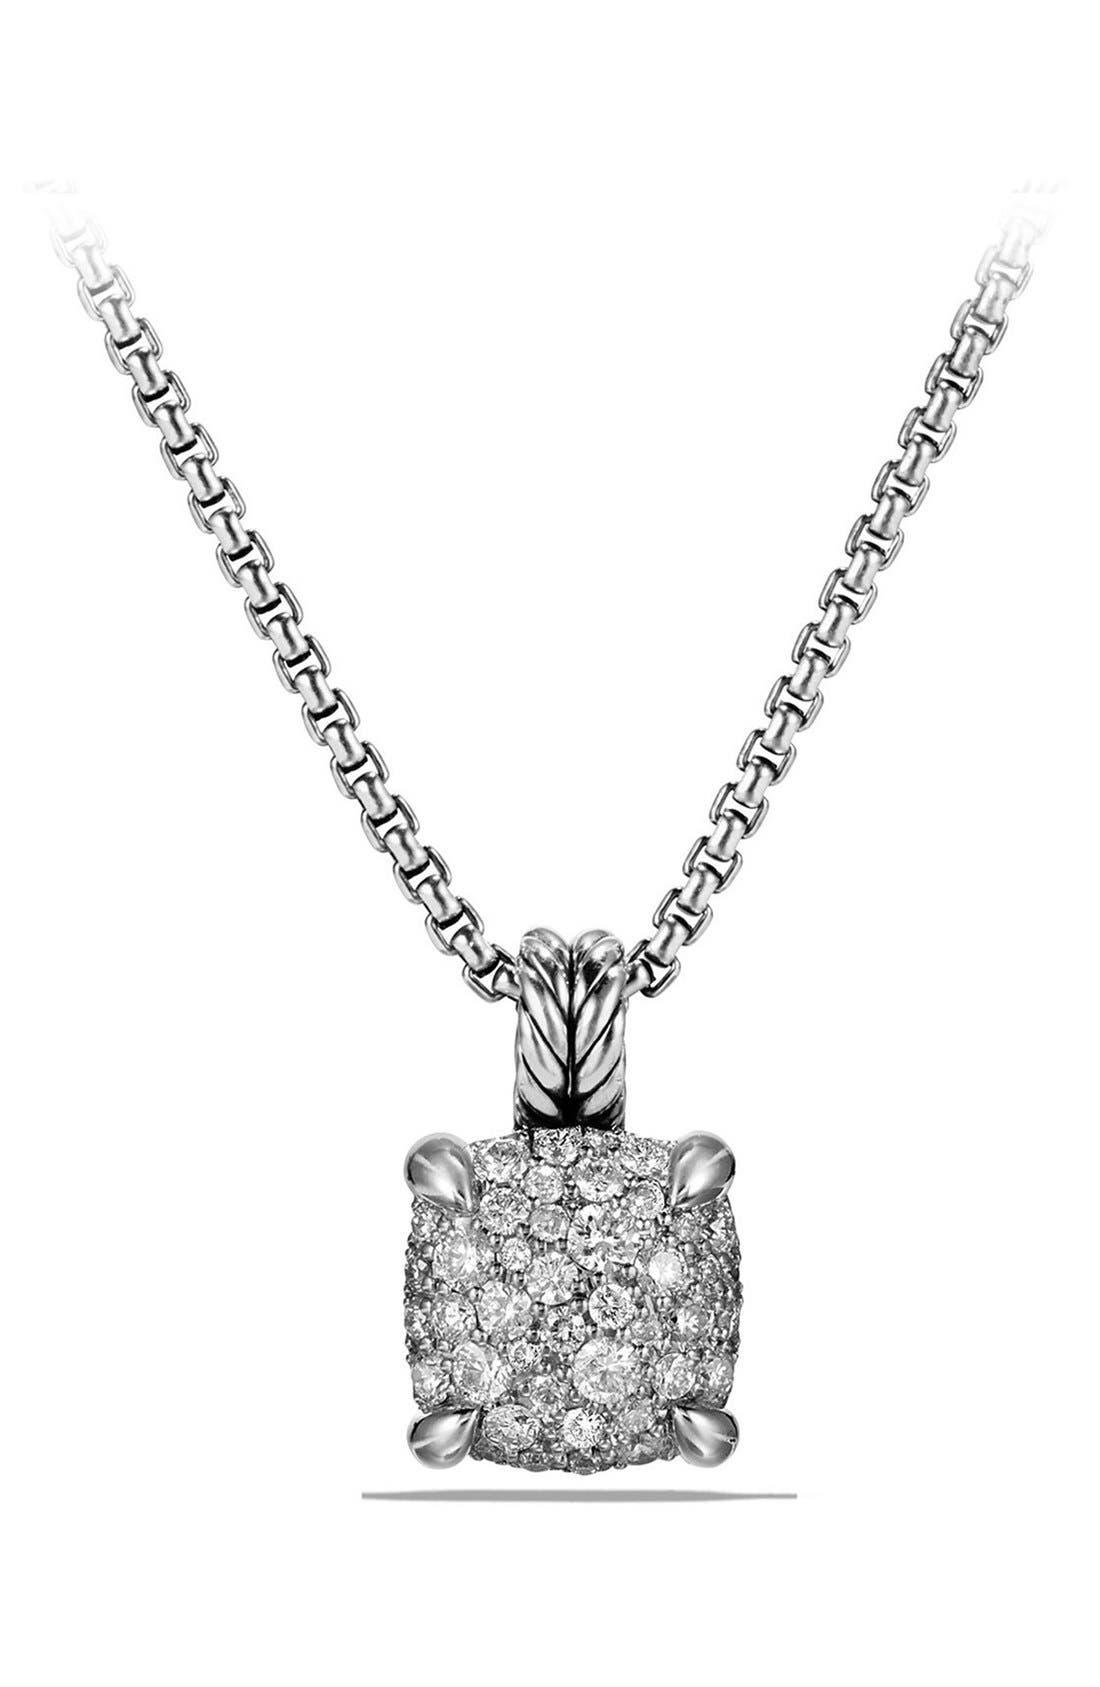 Alternate Image 1 Selected - David Yurman 'Châtelaine' Pendant Necklace with Diamonds